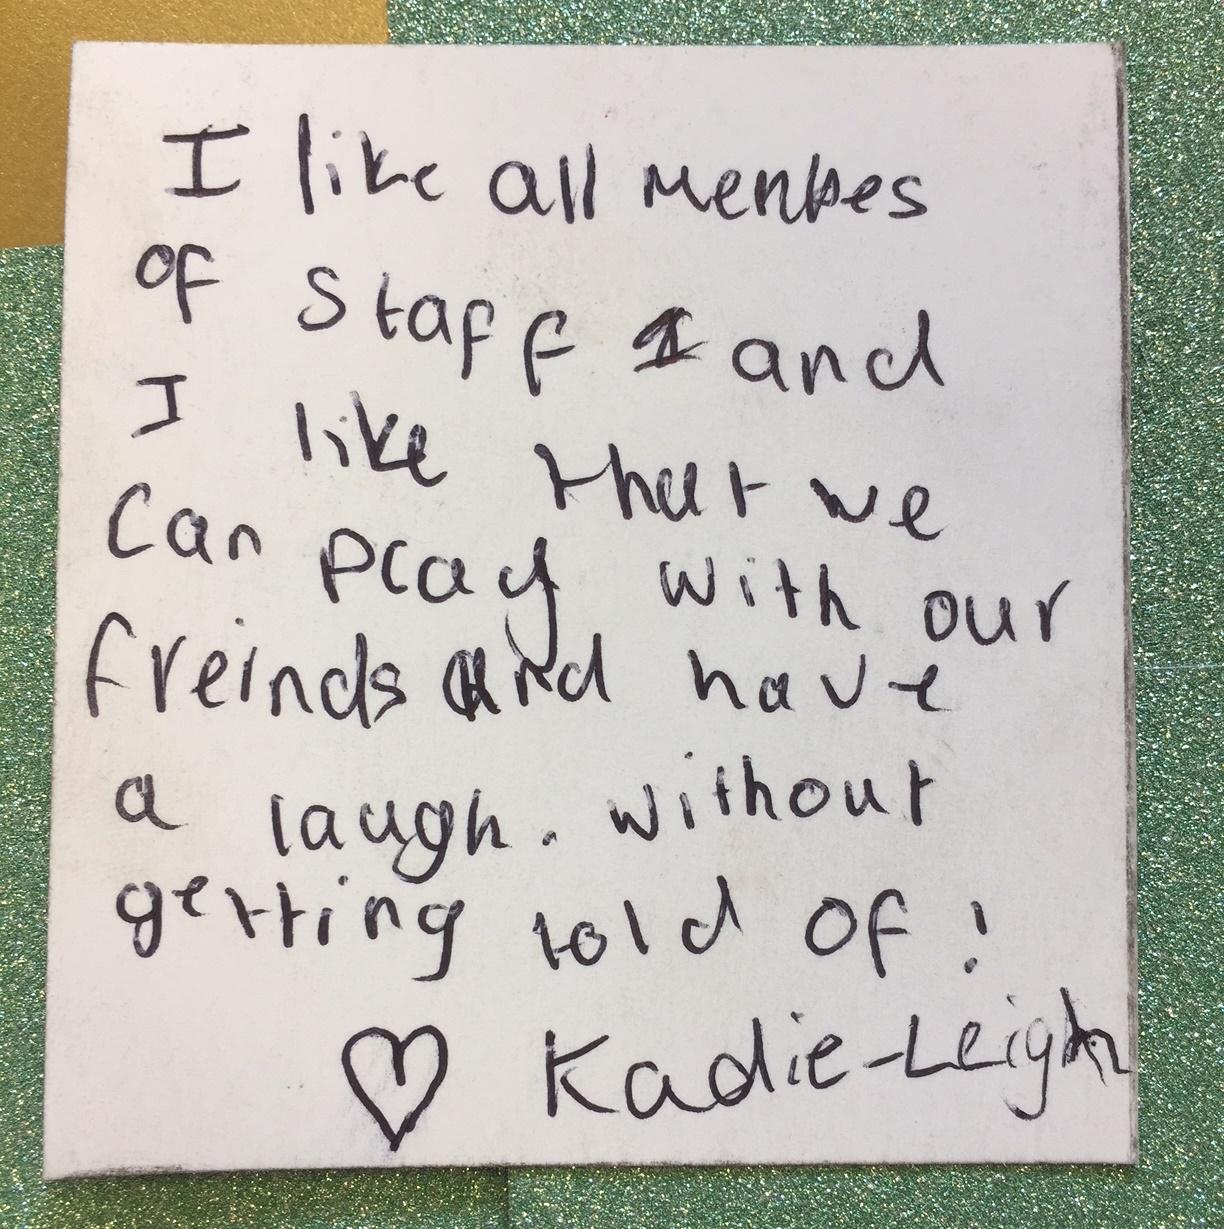 Kadie-Leigh